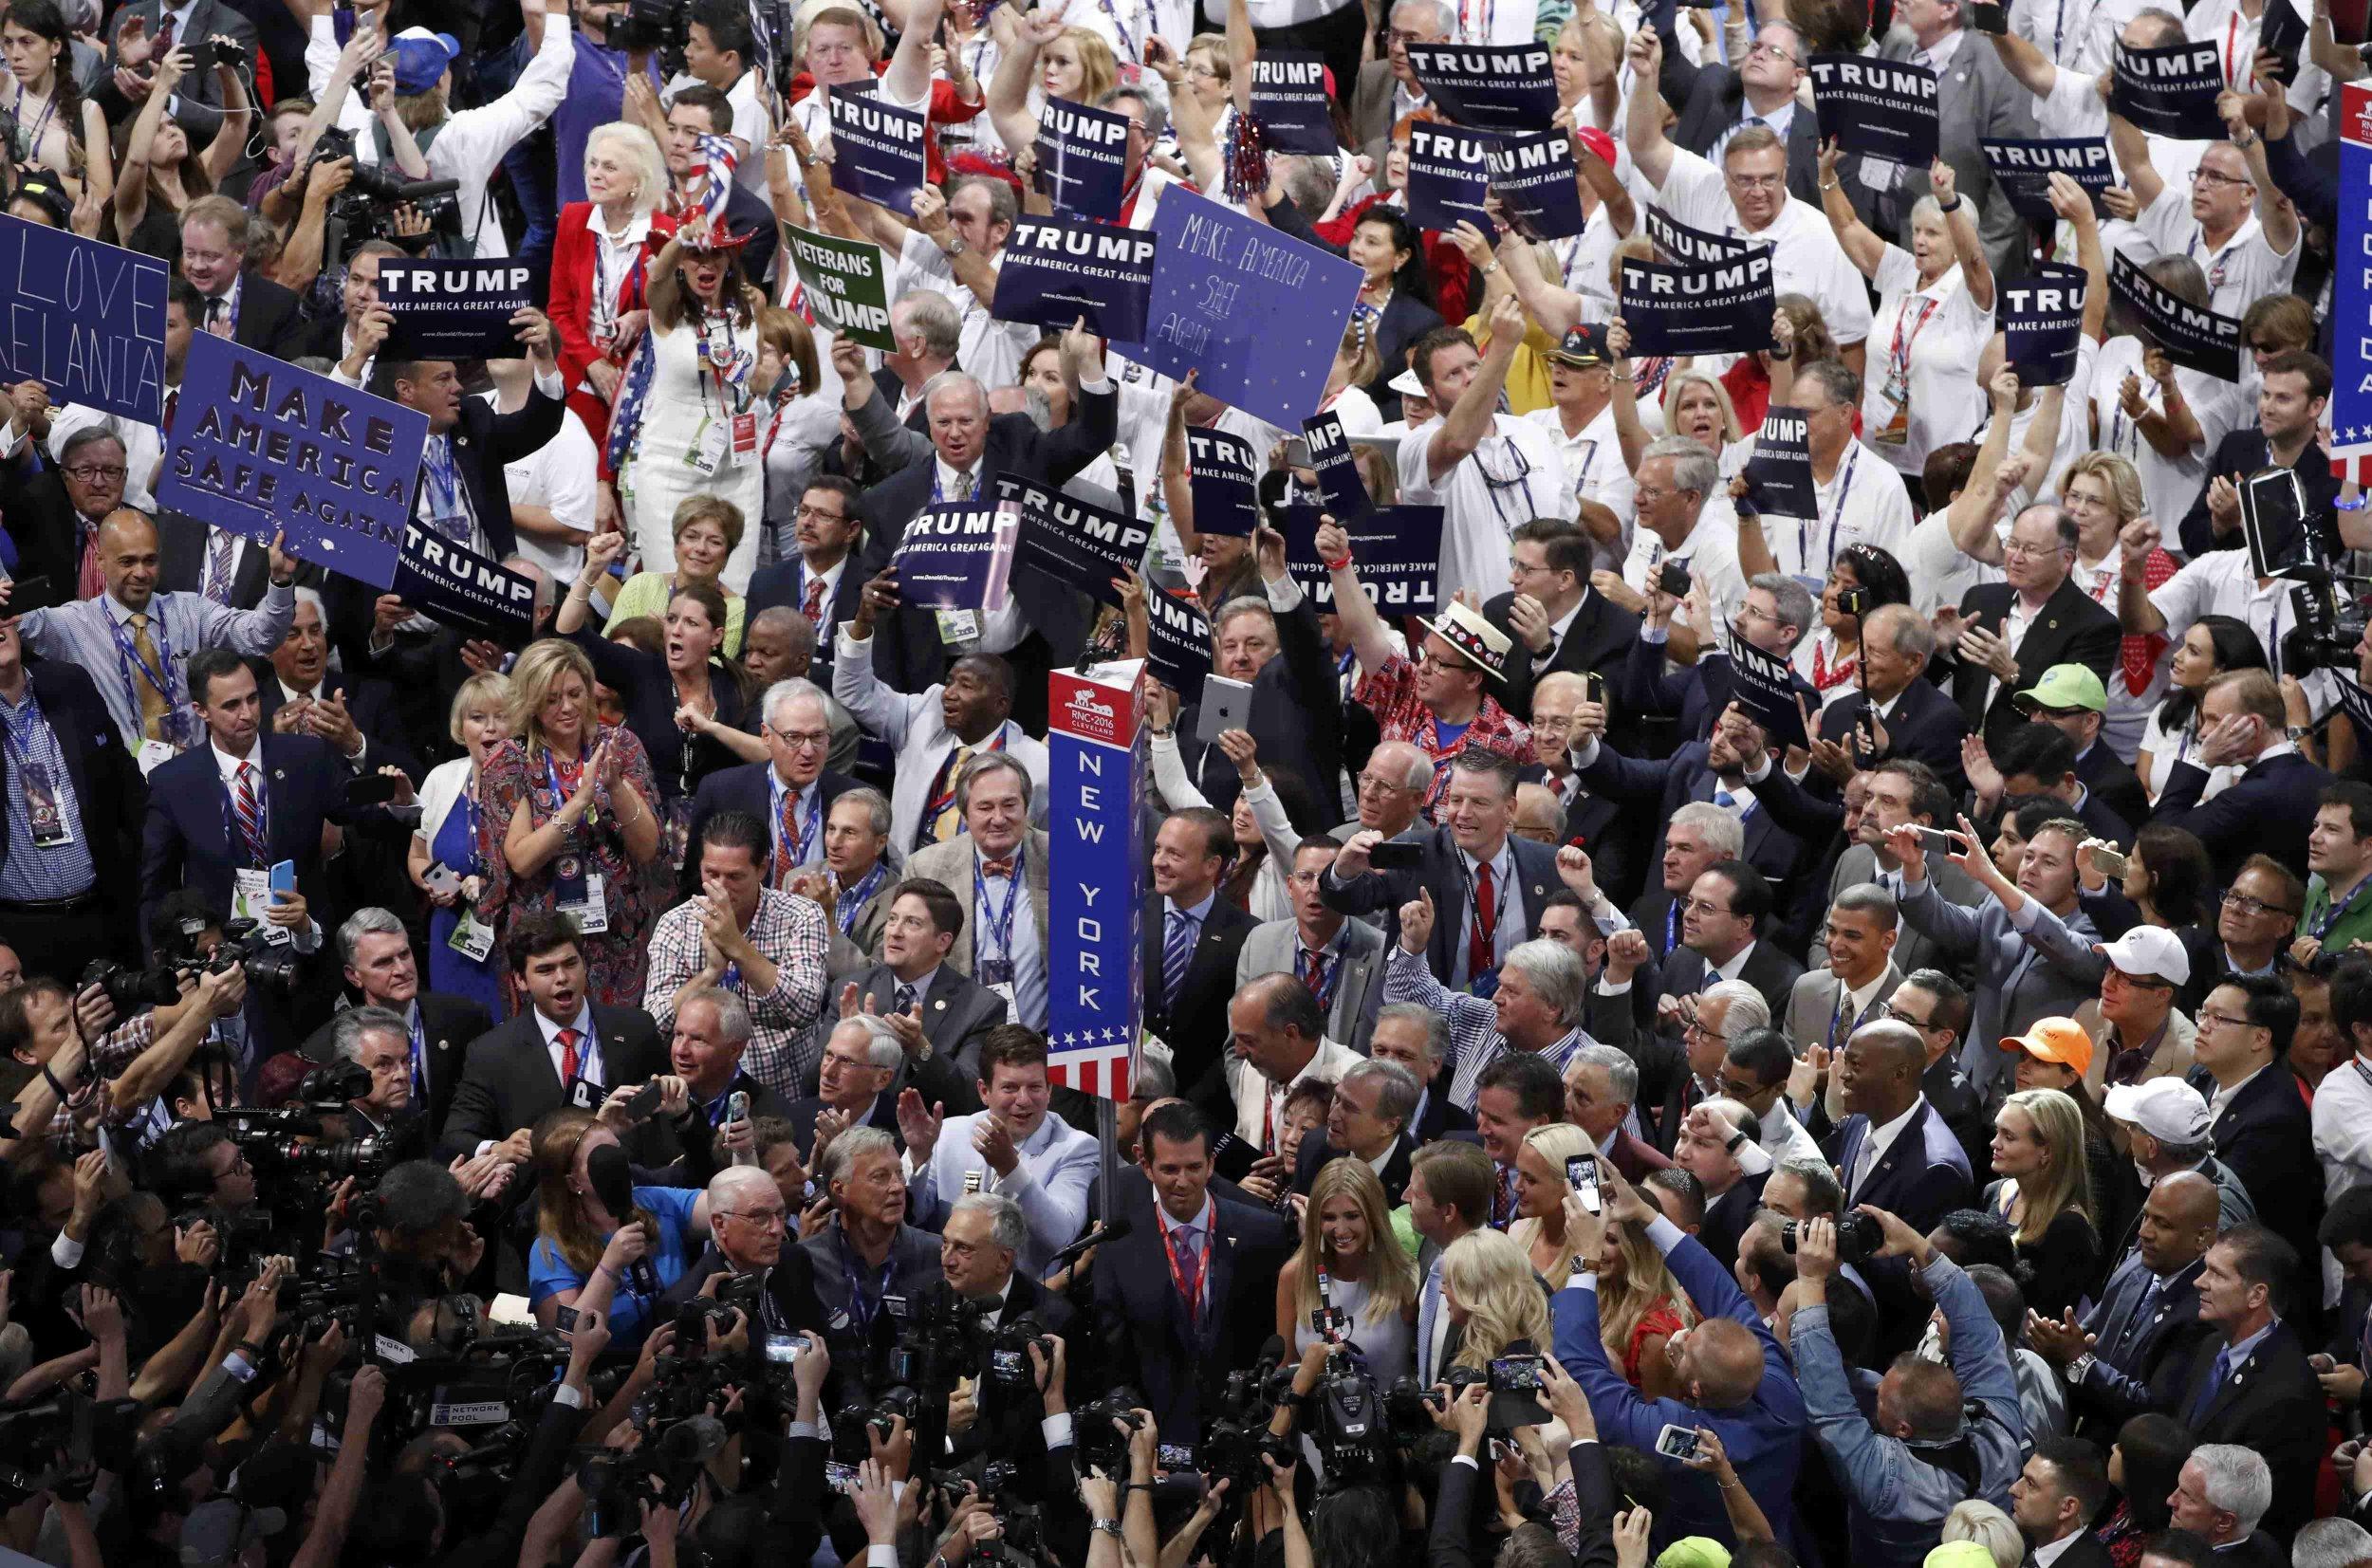 2016-07-19T232030Z_250845377_HT1EC7J1STCX5_RTRMADP_3_USA-ELECTION-REPUBLICANS